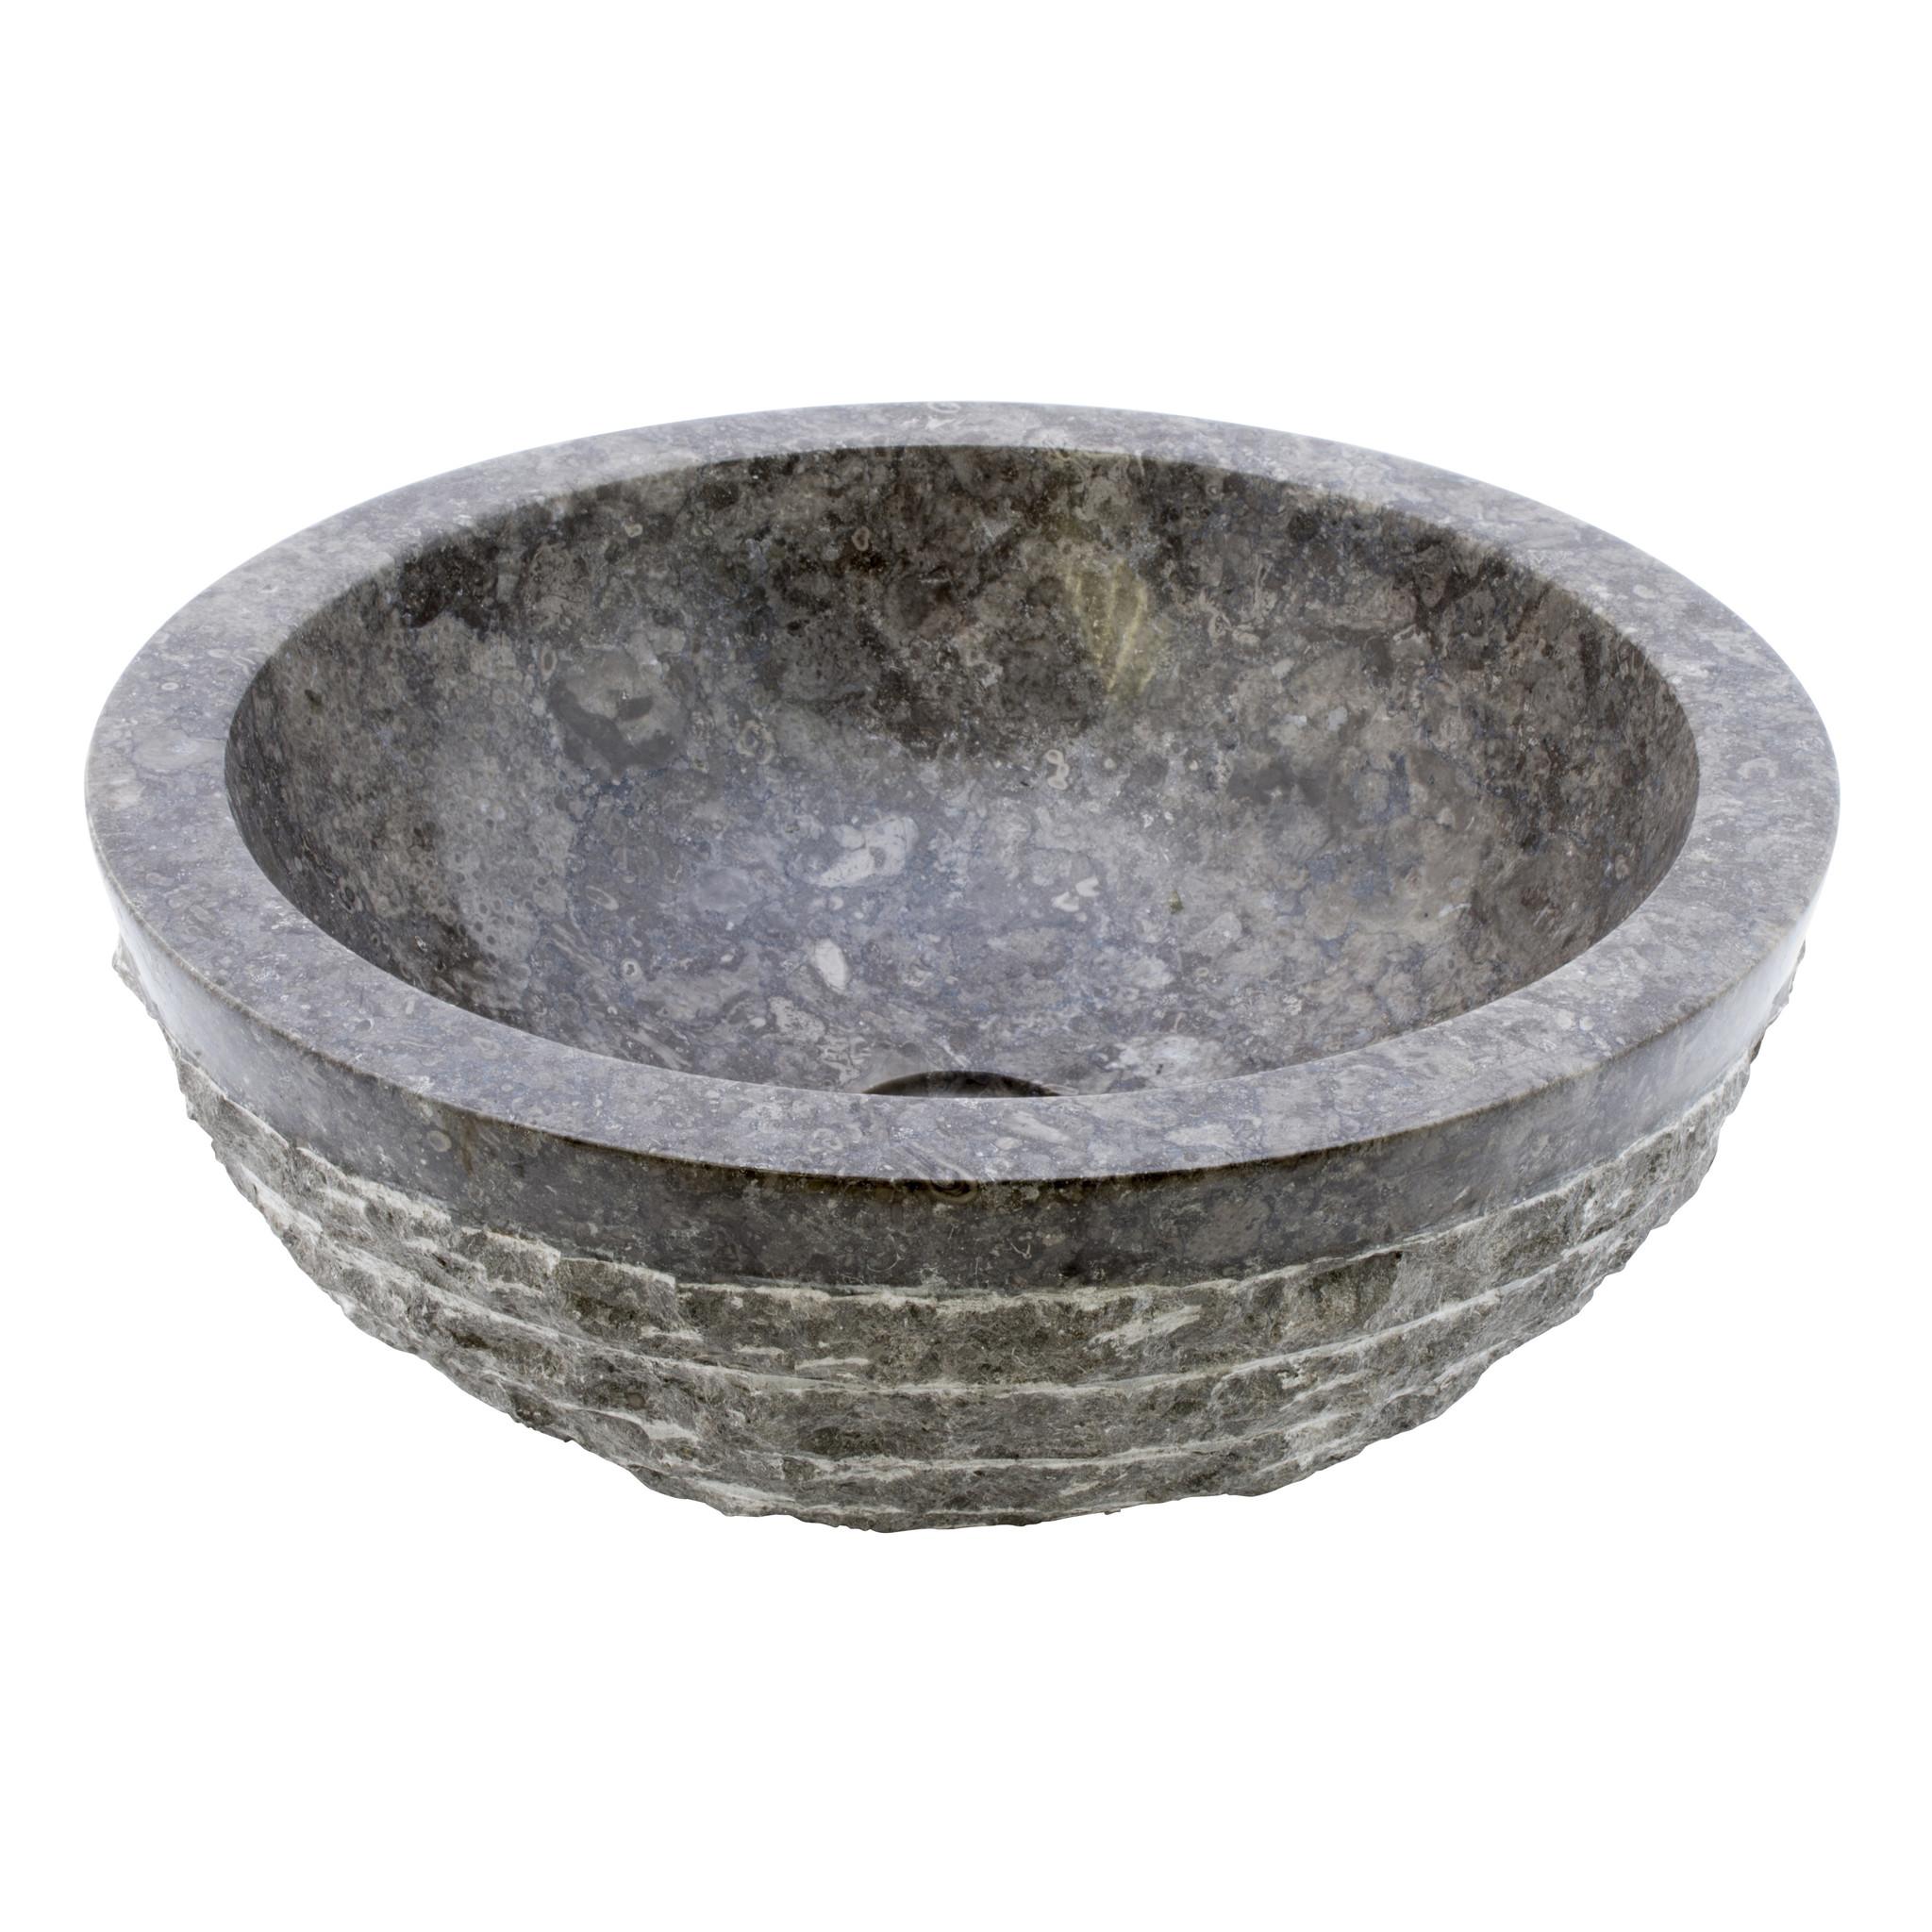 Indomarmer Gray Marble Wash bowl Marmo-Polish Ø 40 x H 15 cm